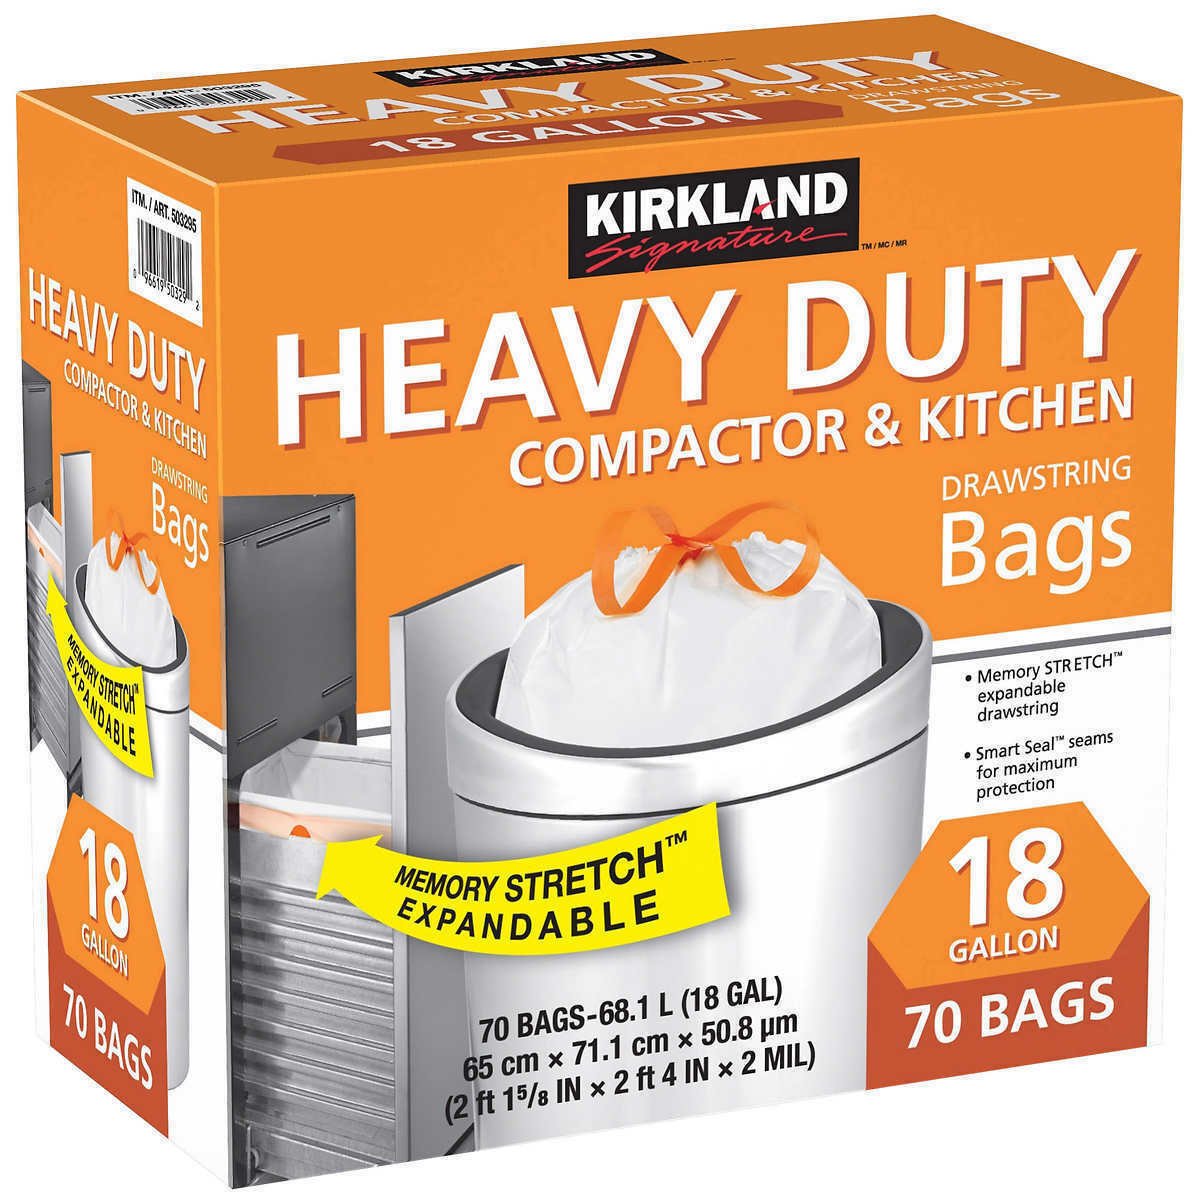 Kirkland 18-Gallon Compactor & Kitchen Trash Bag, 70-count,